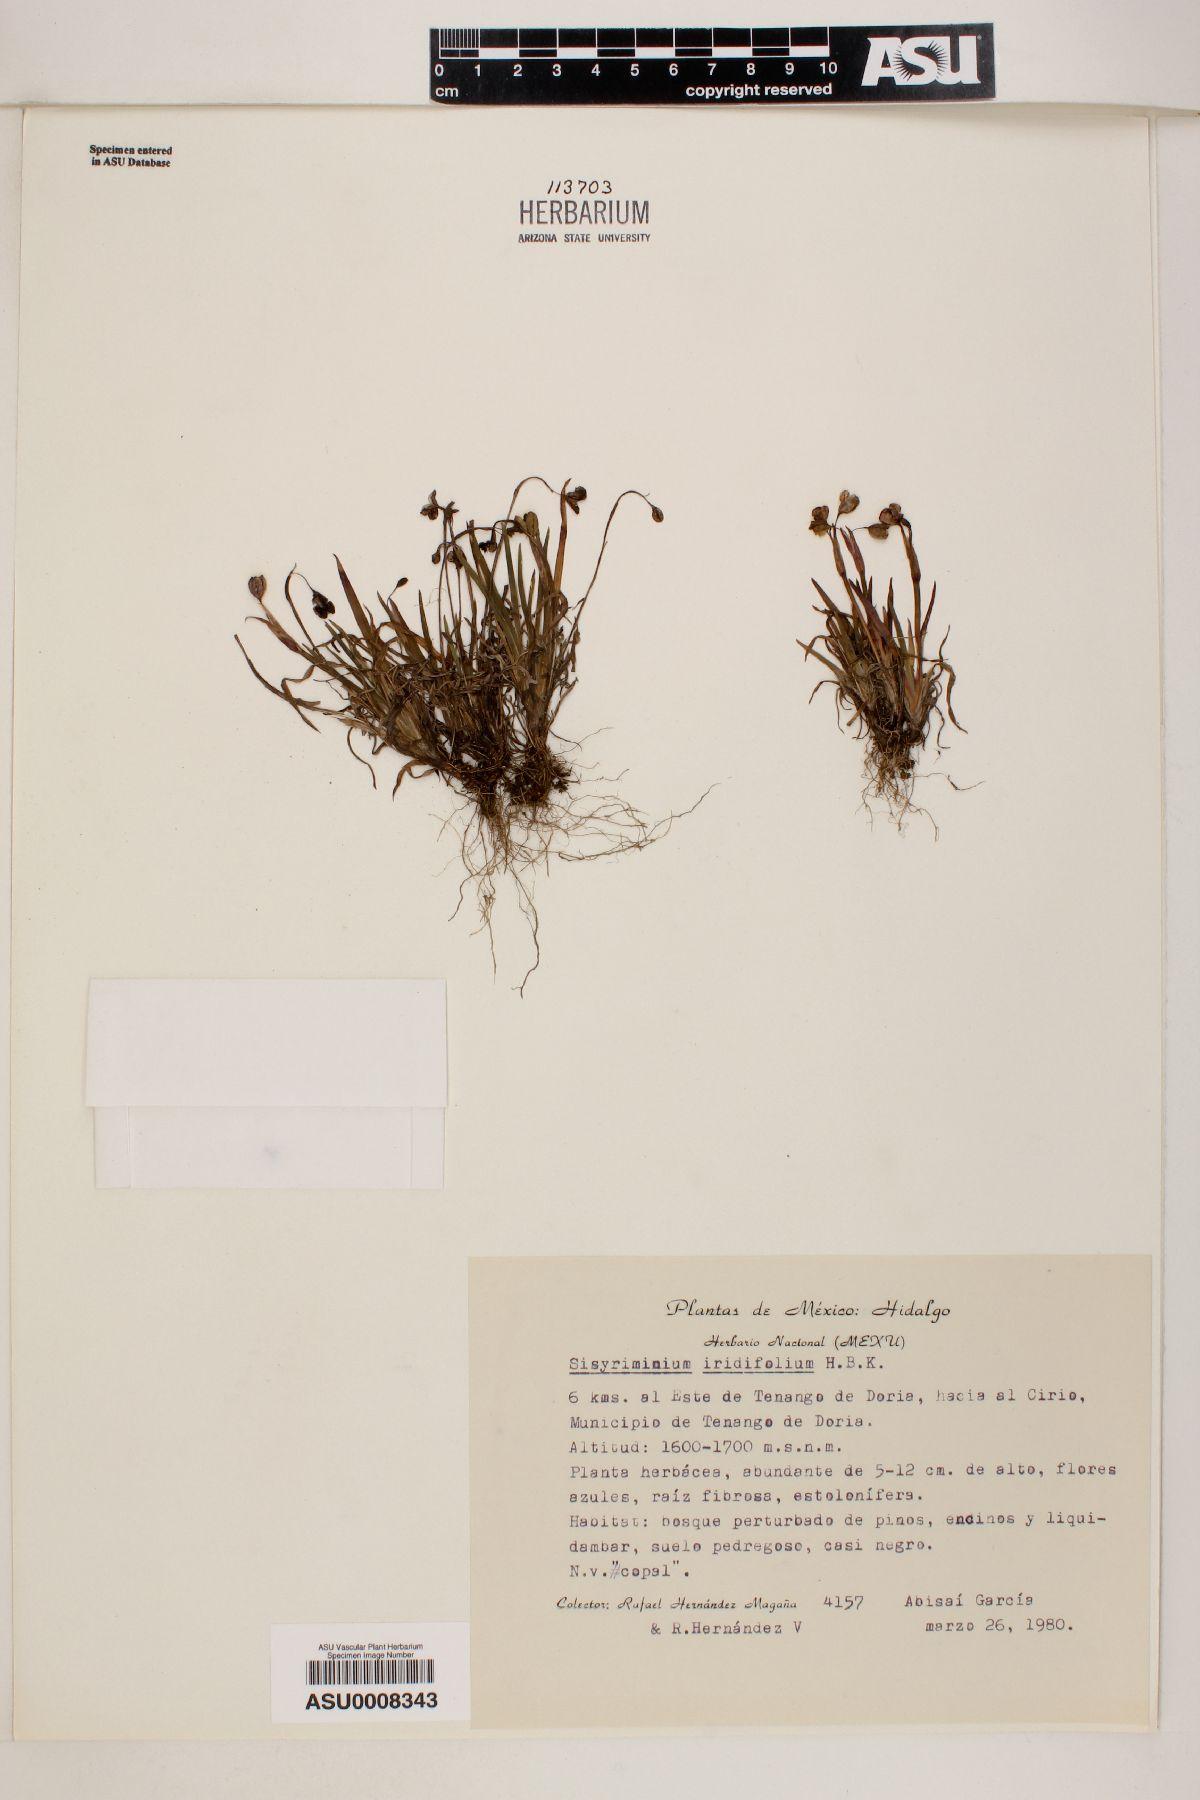 Sisyrinchium iridifolium image